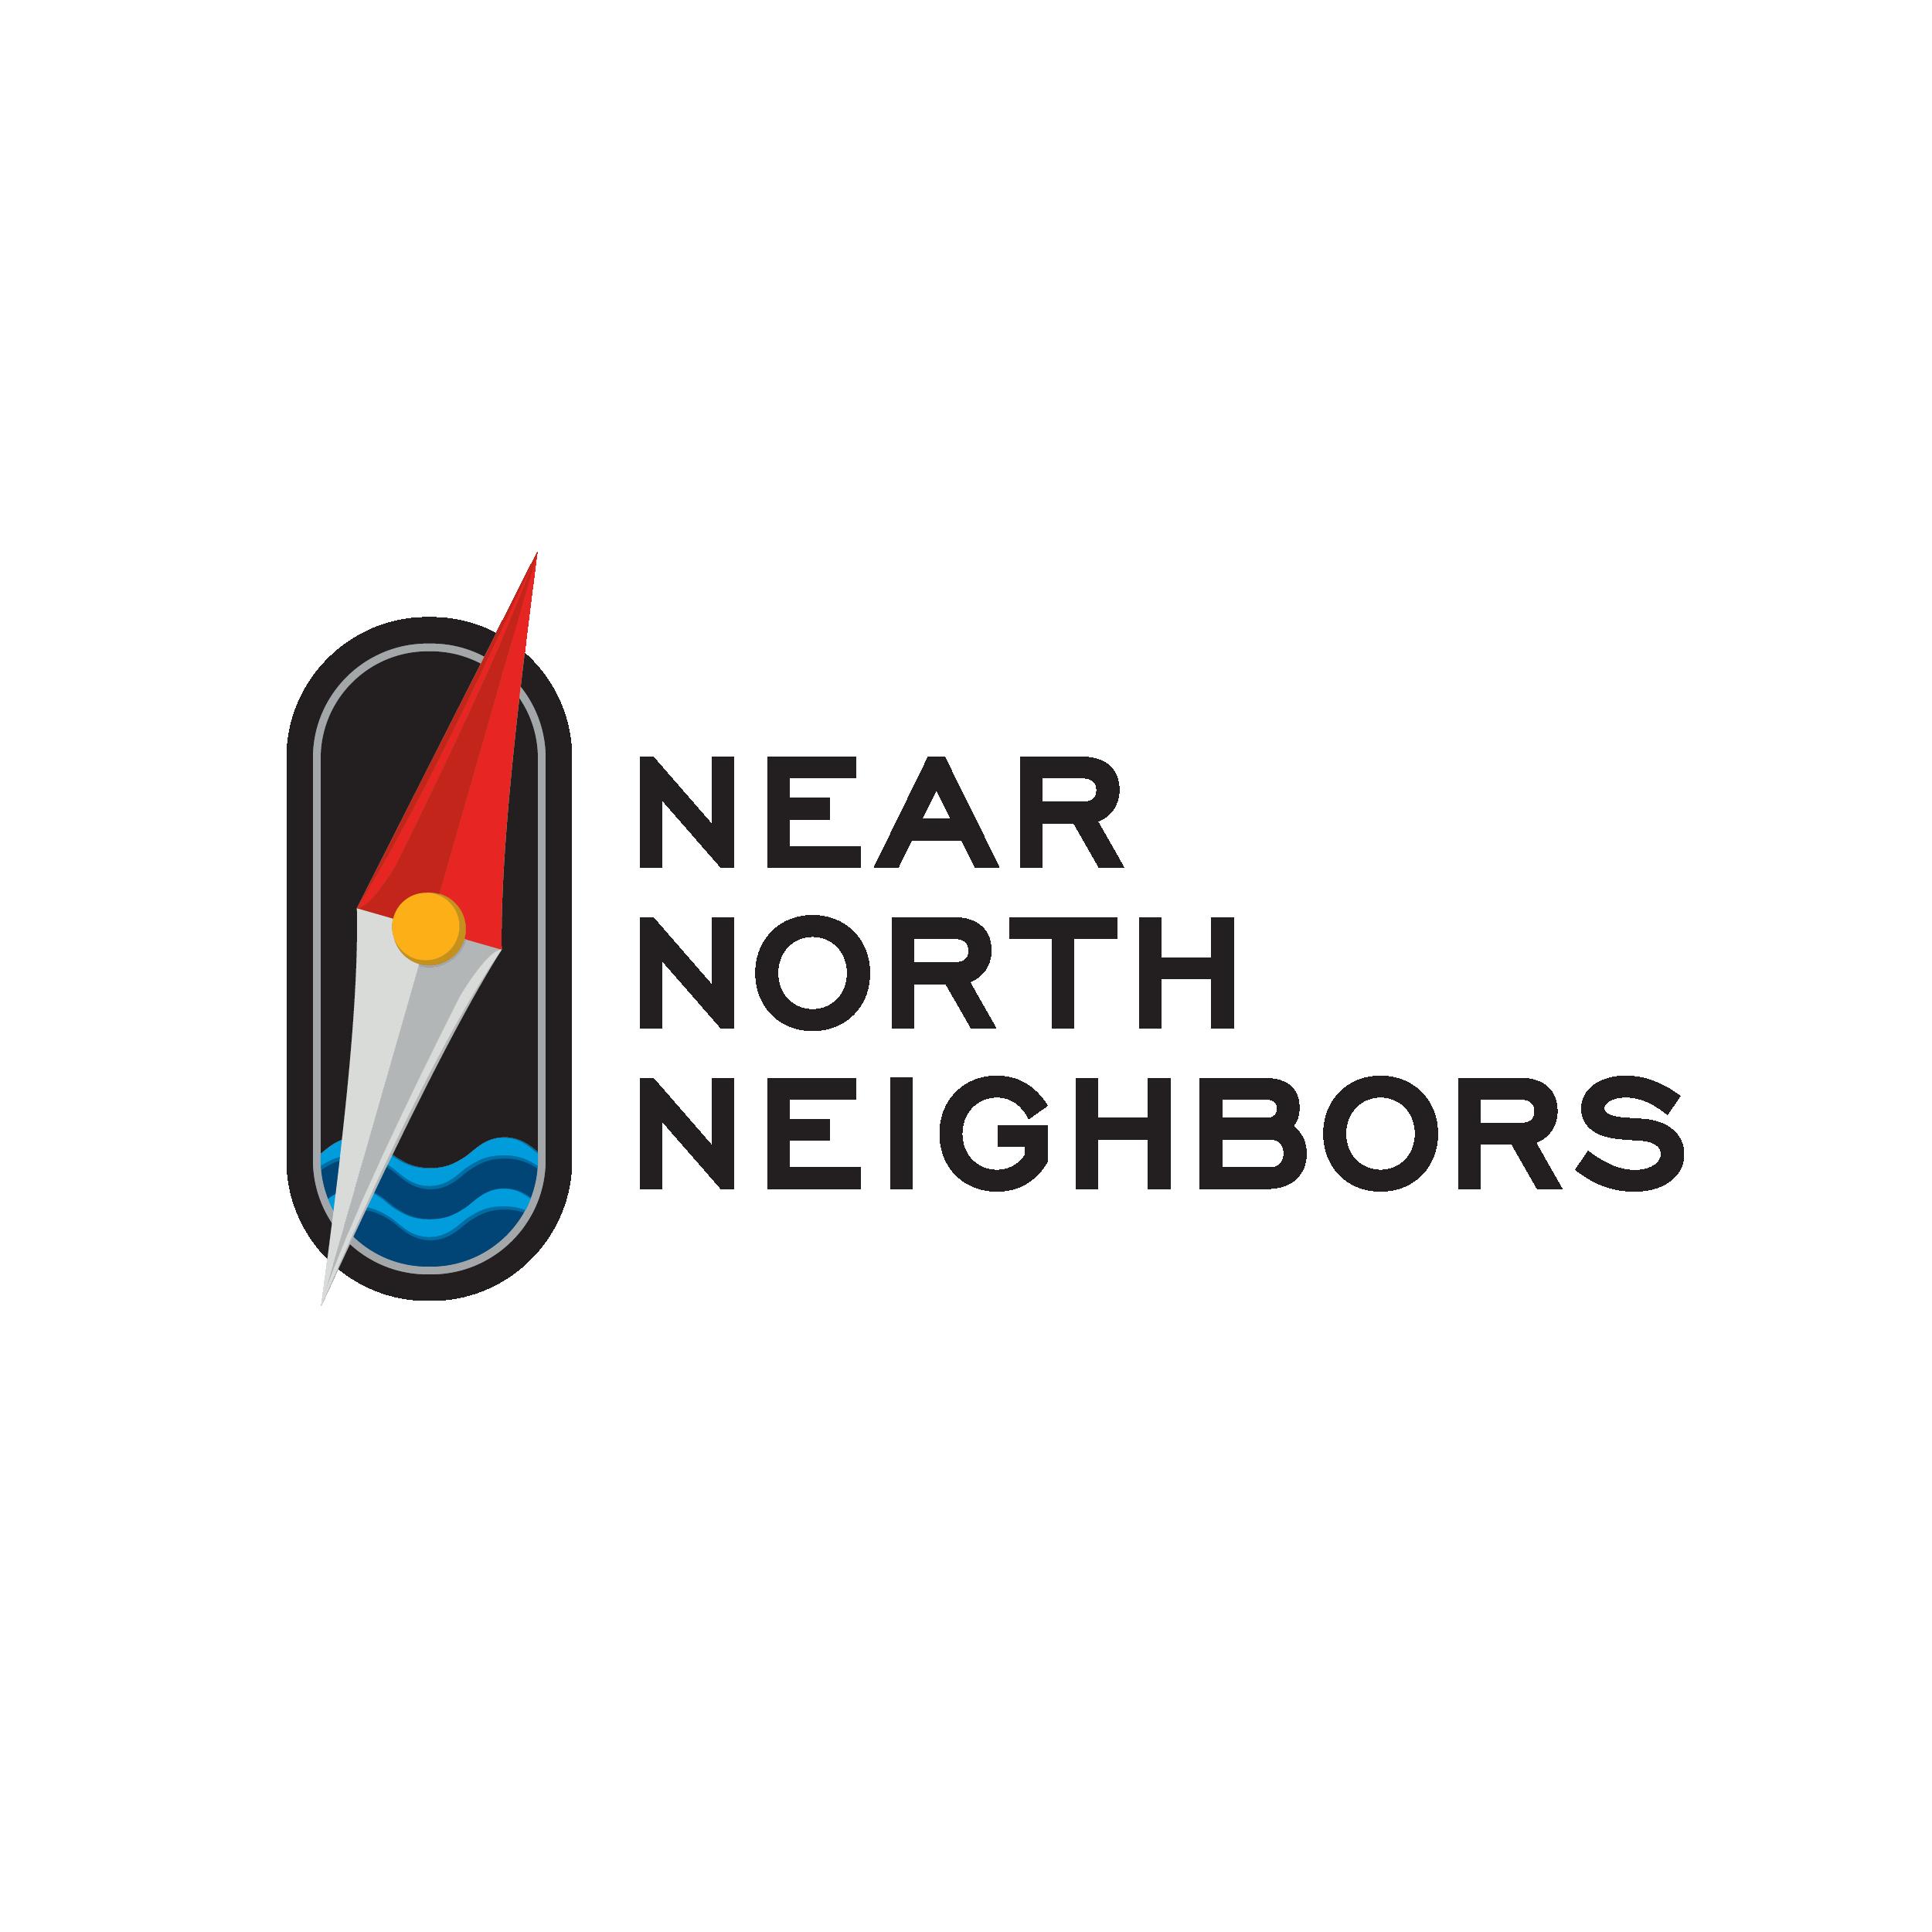 Near North Neighbors